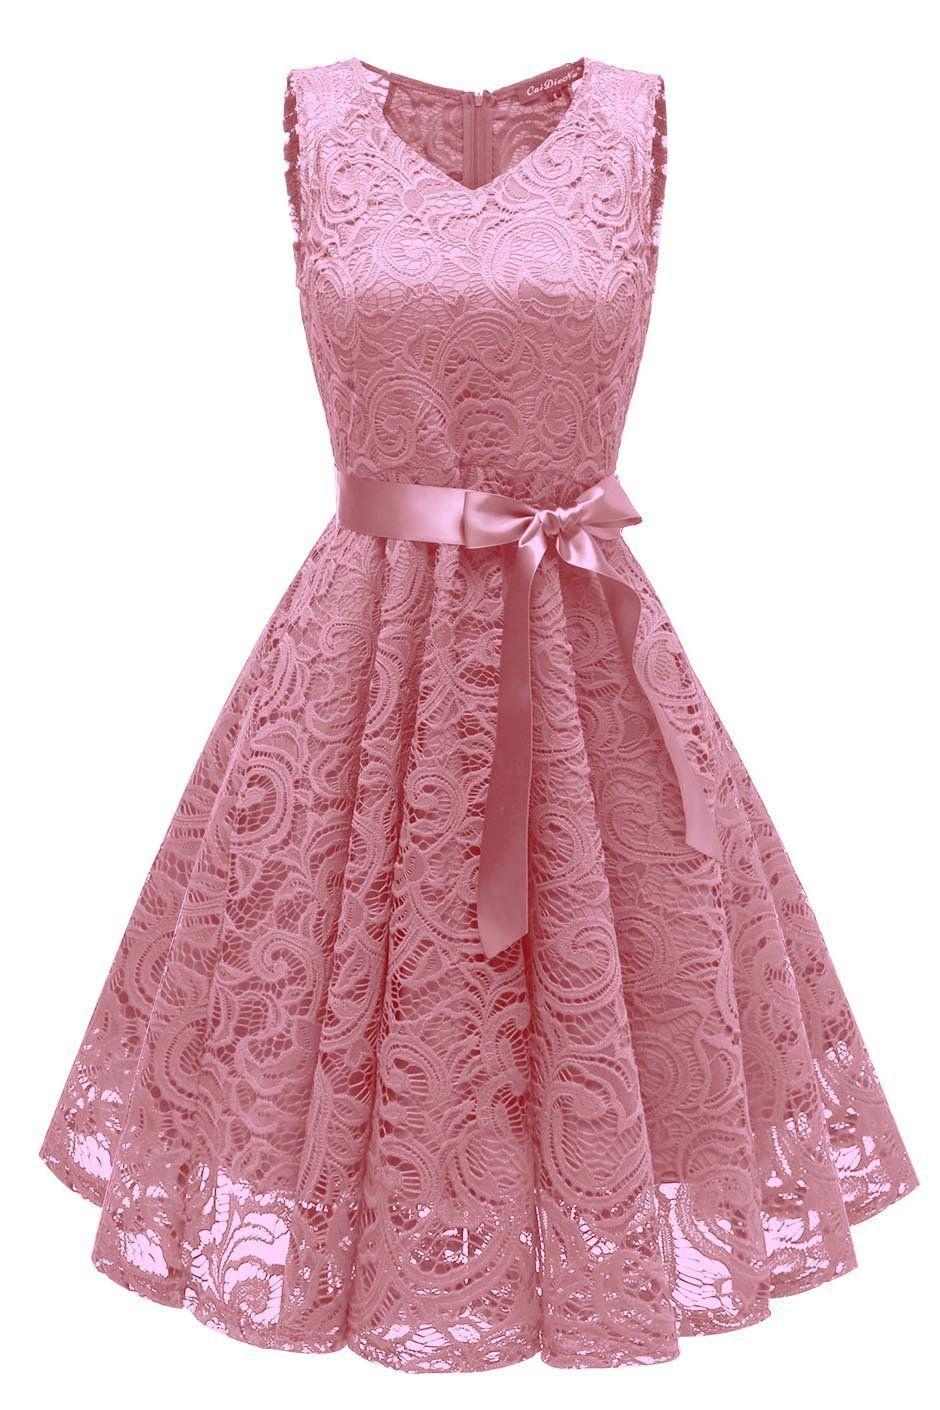 Chicloth rockabilly ball gown flared dress womenus s vintage